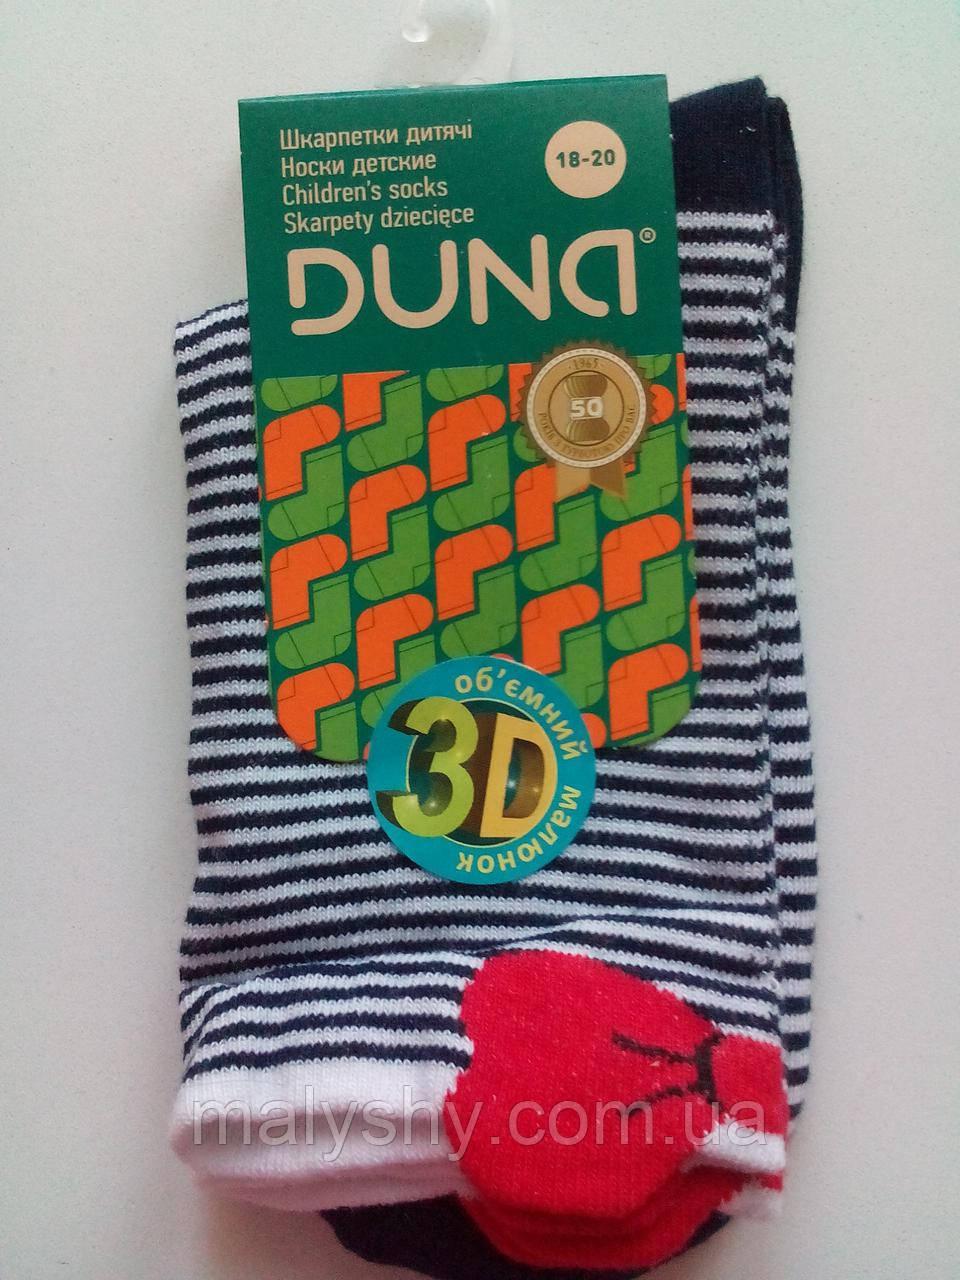 Детские носки демисезонные - Дюна р.18-20 (шкарпетки дитячі) 5в400-1626-темно-синий